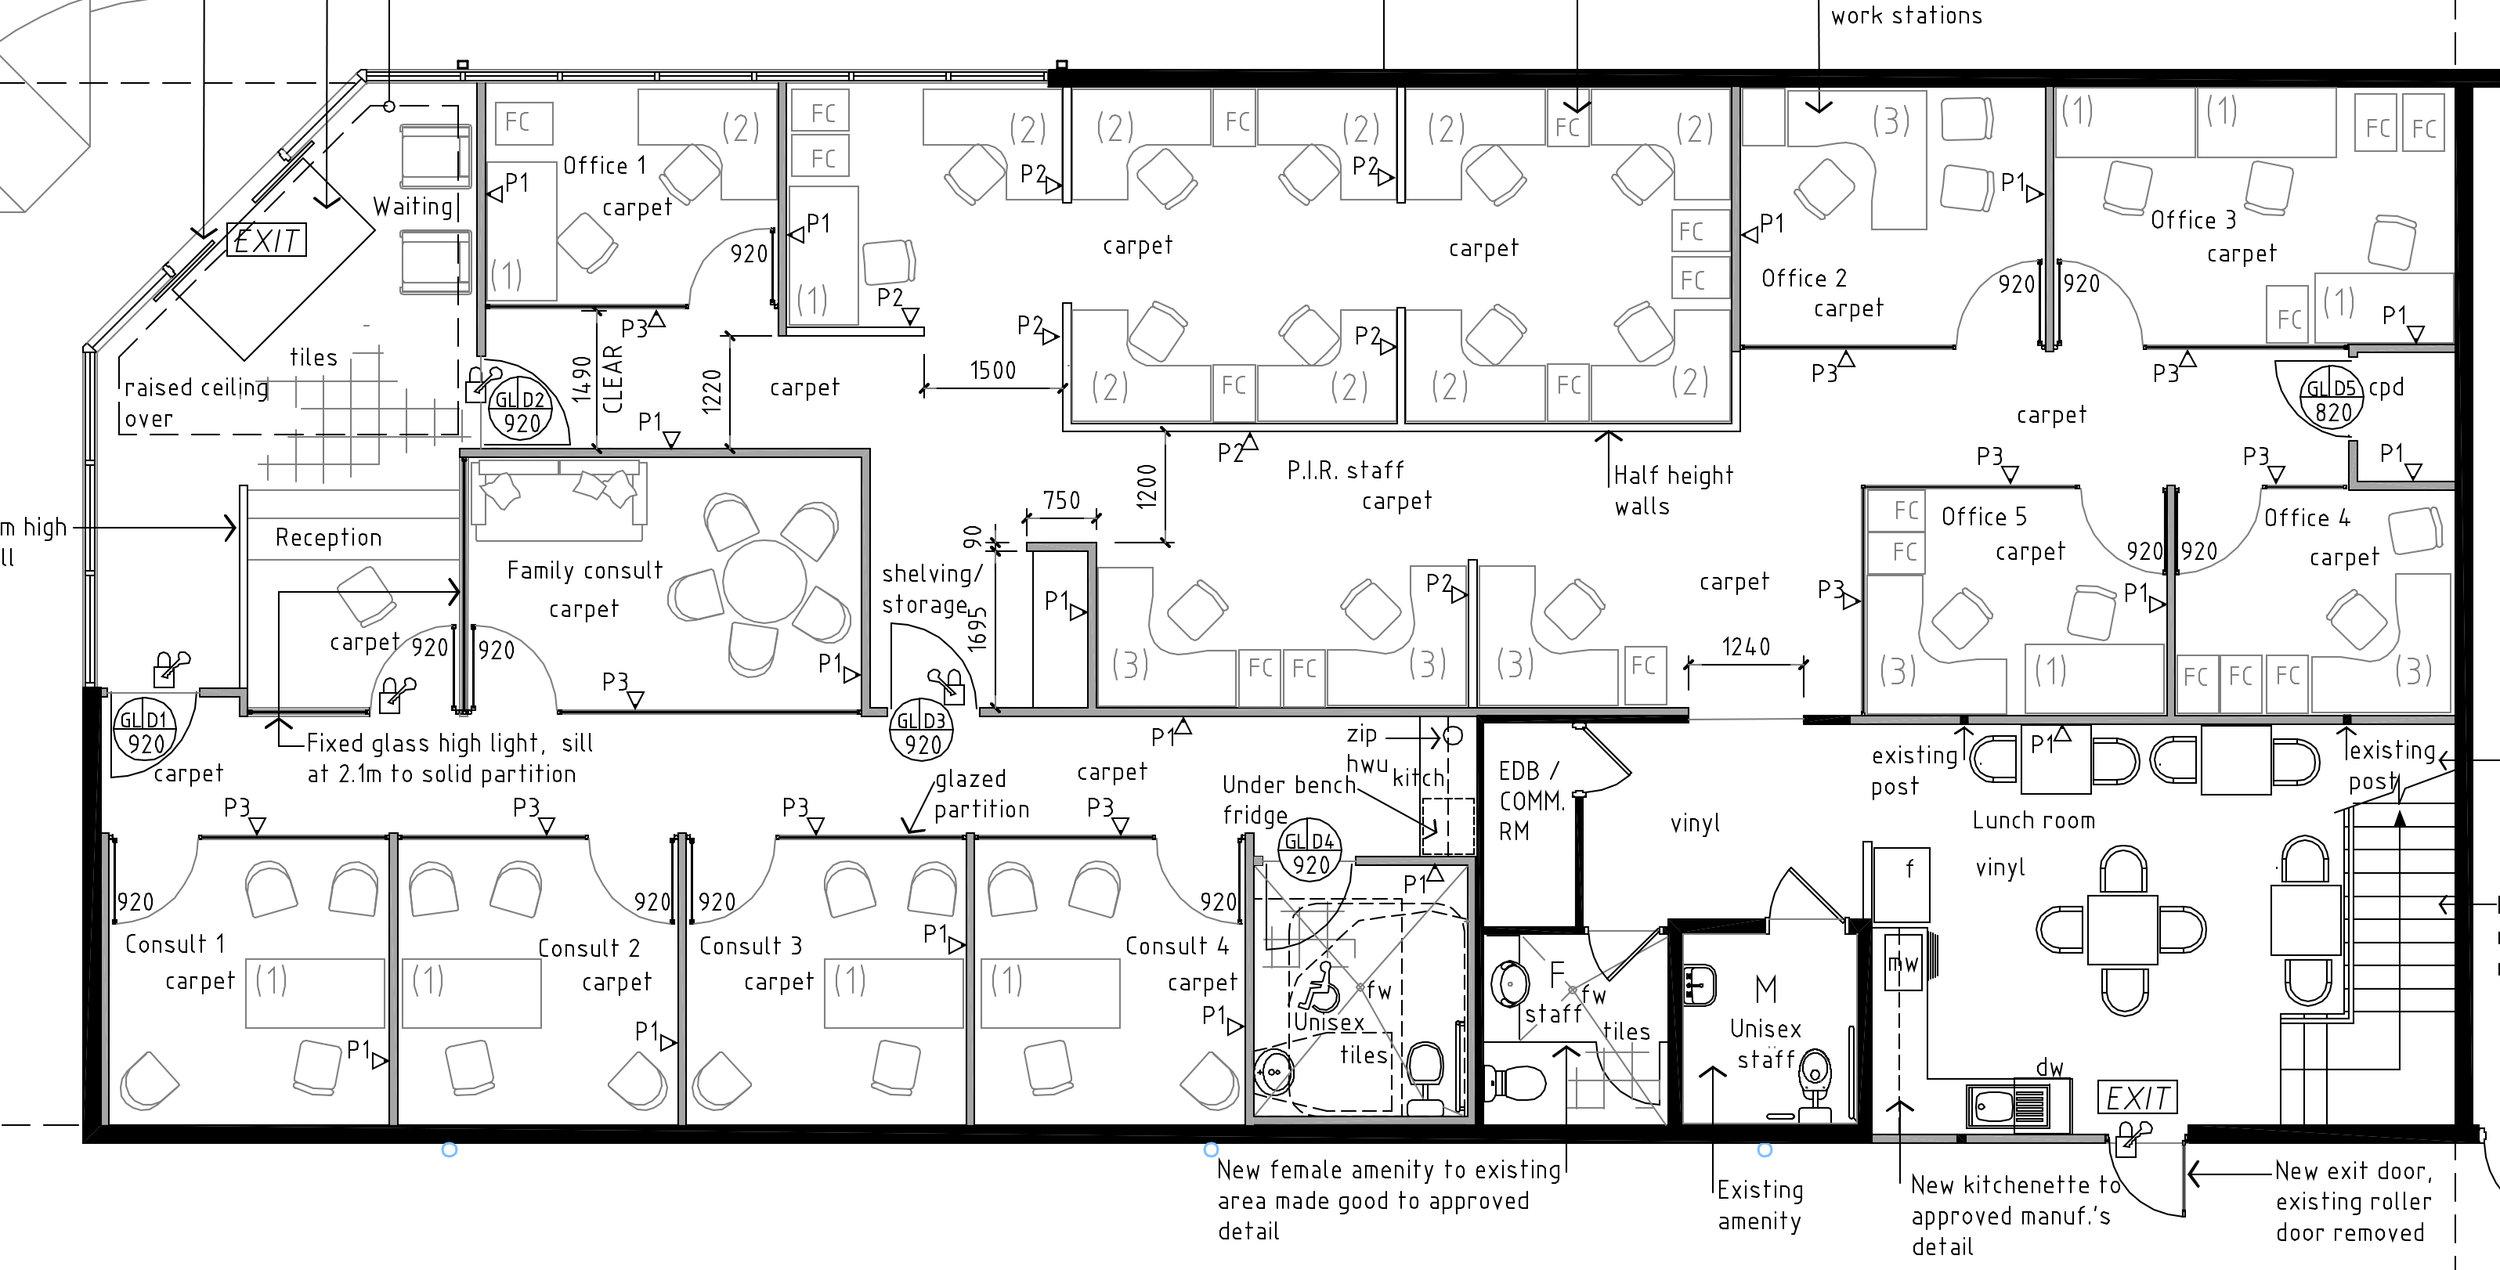 004.03.13_tenancy layout.jpg